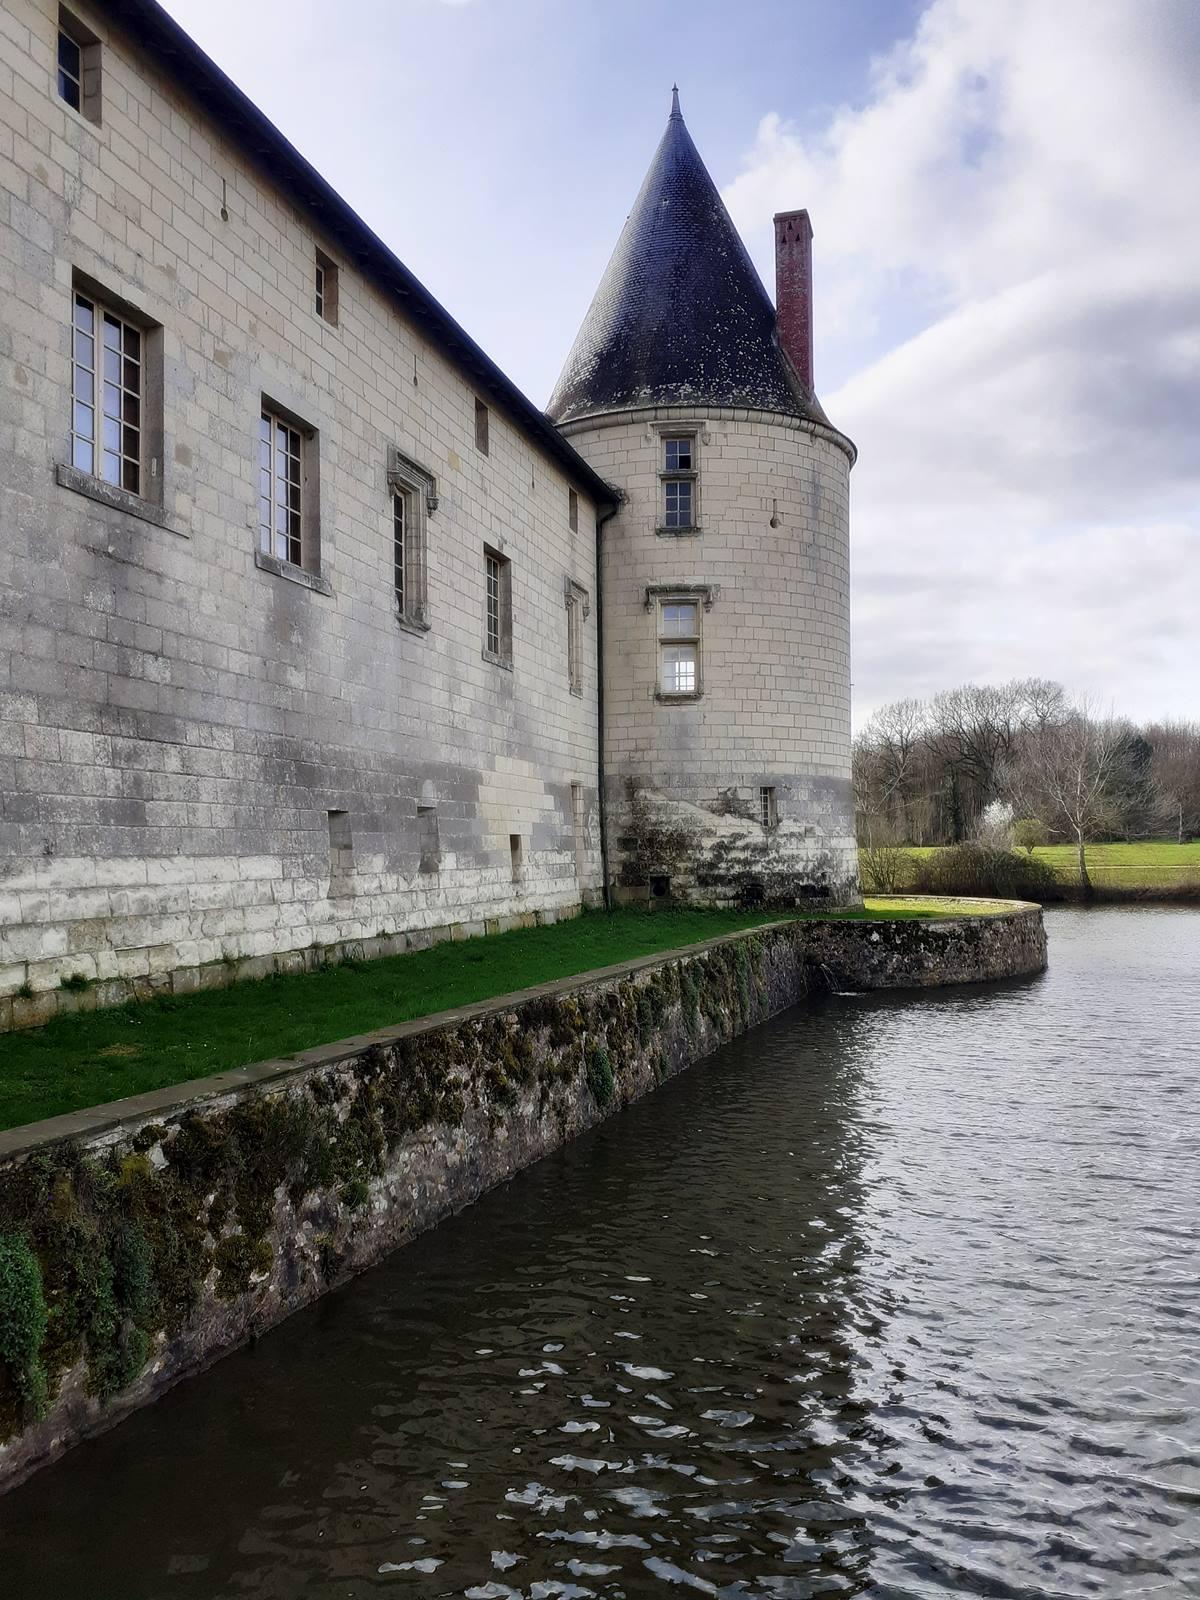 Chateau plessis bourre maine loire tourisme20200222 151045